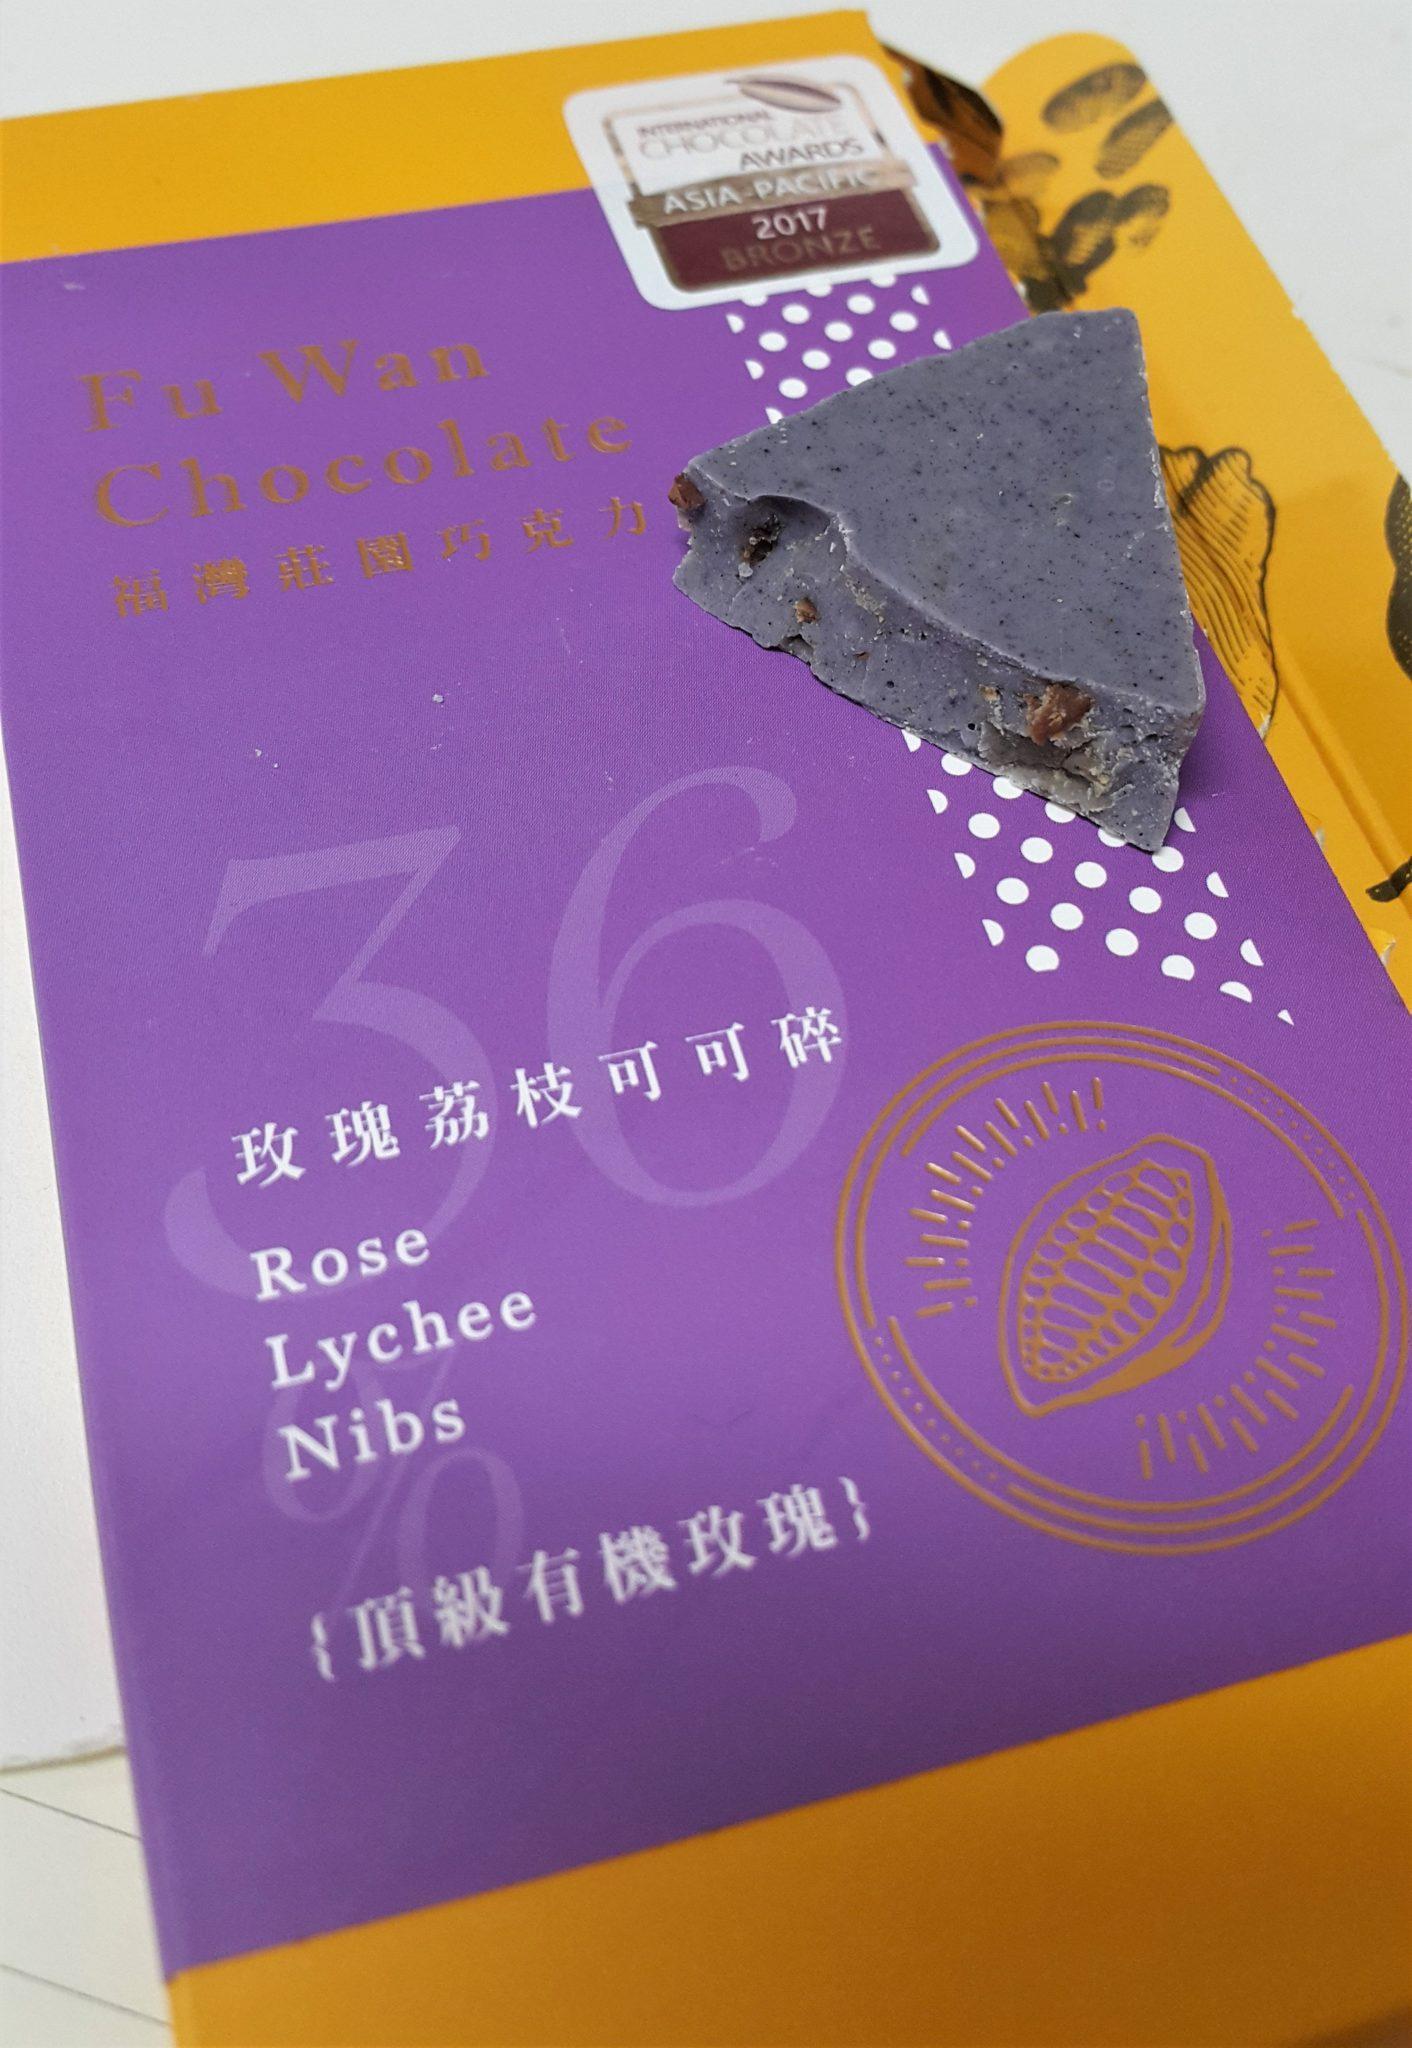 Fuwan Chocolate Rose Lychee litchi nibs 36% white chocolate